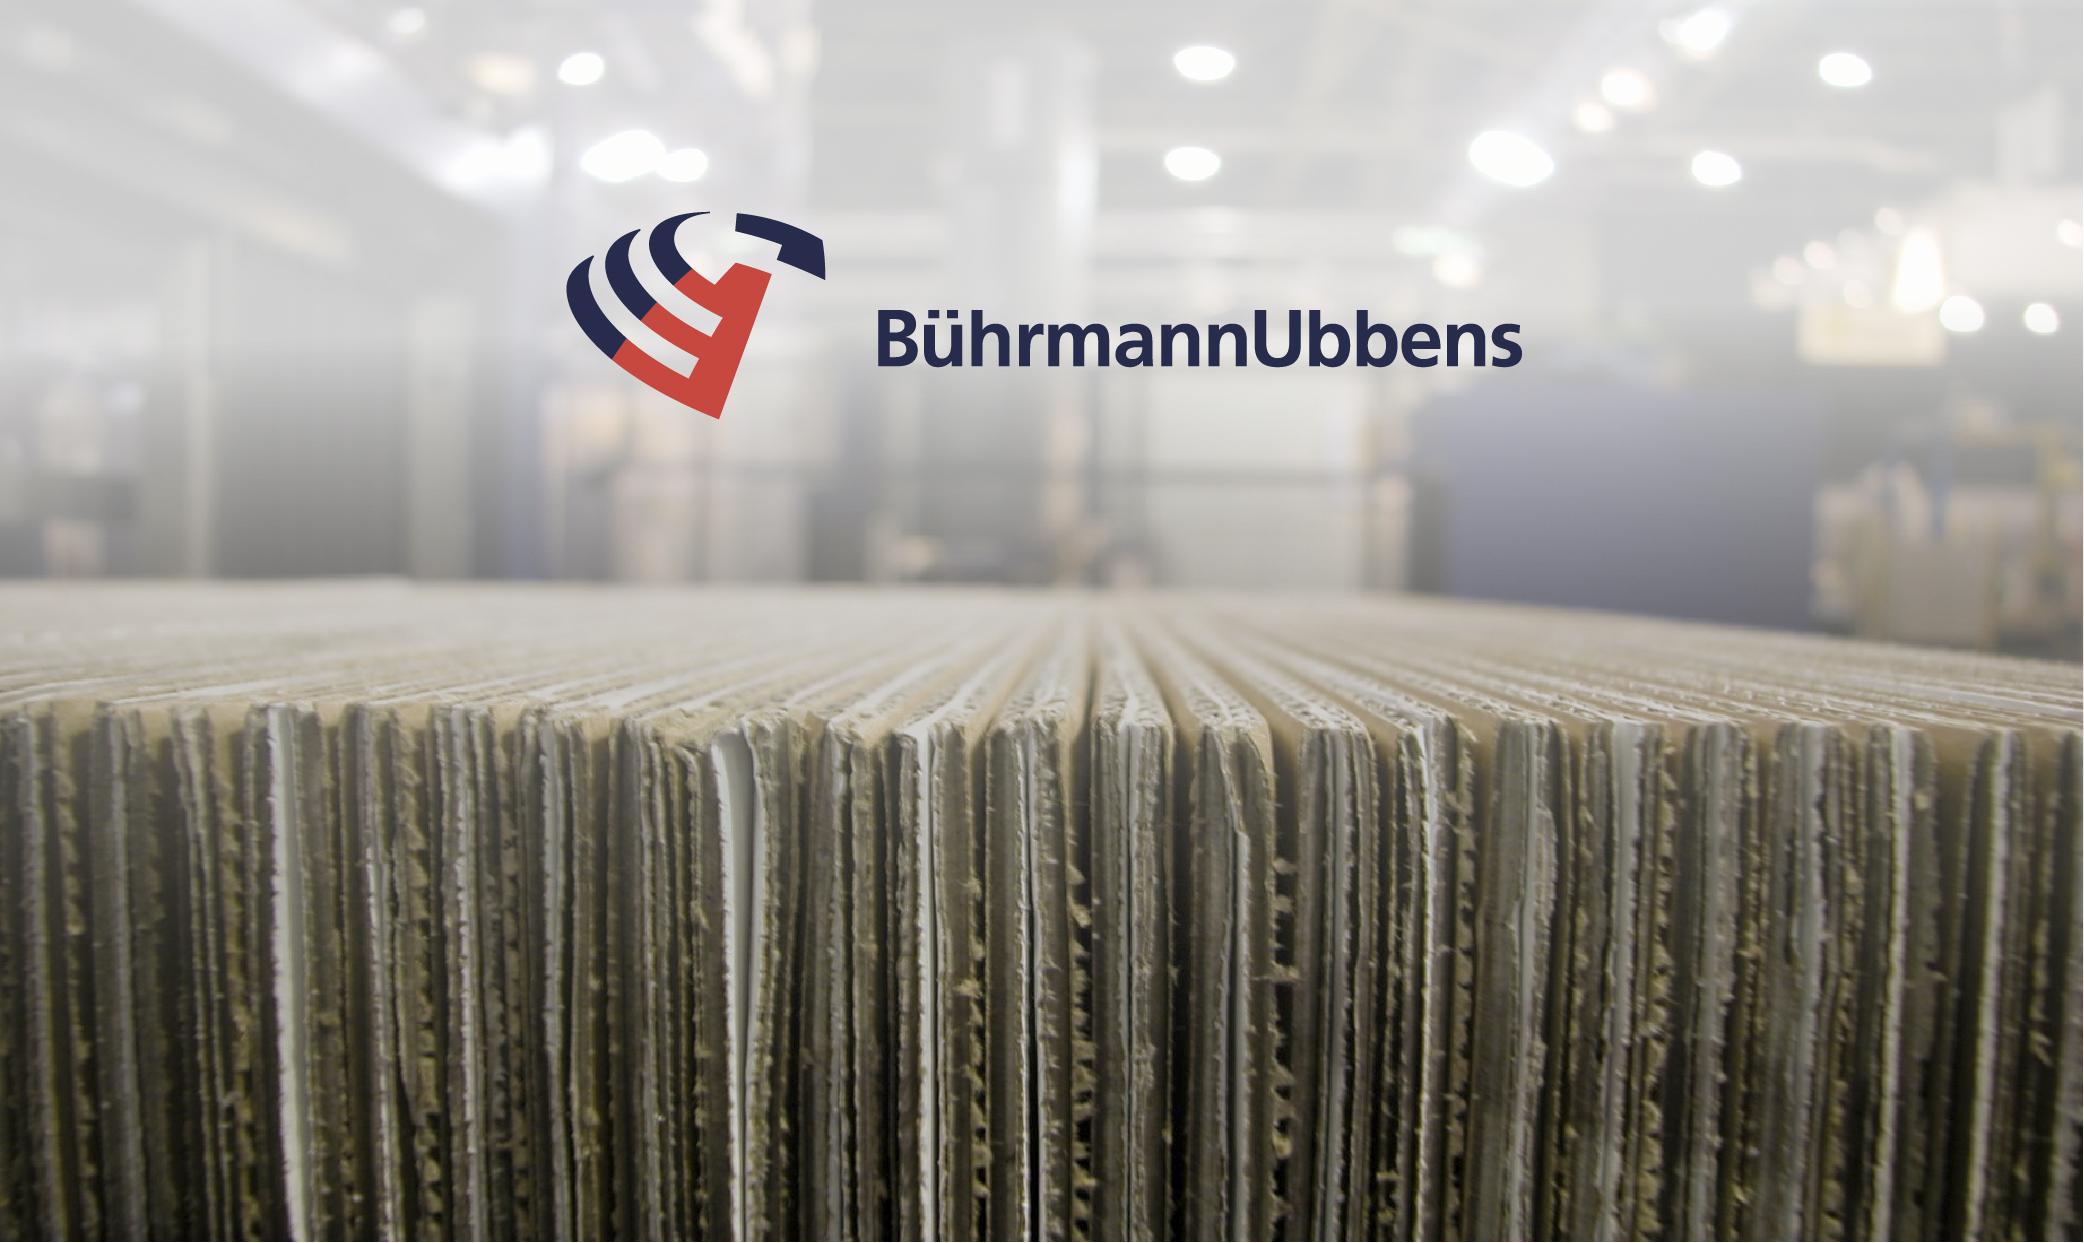 """BührmannUbbens"